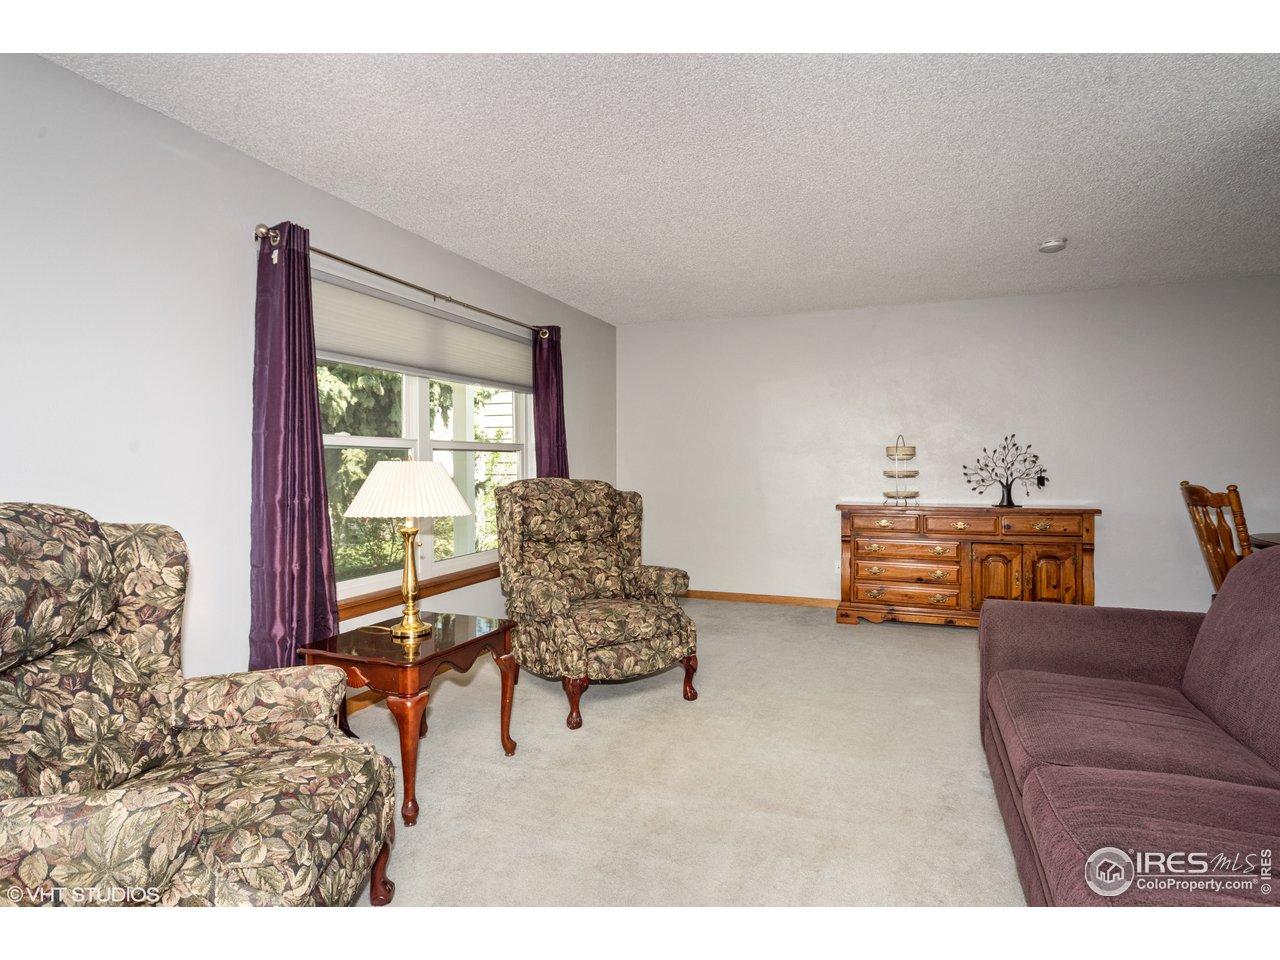 Formal living room. Double pane vinyl windows